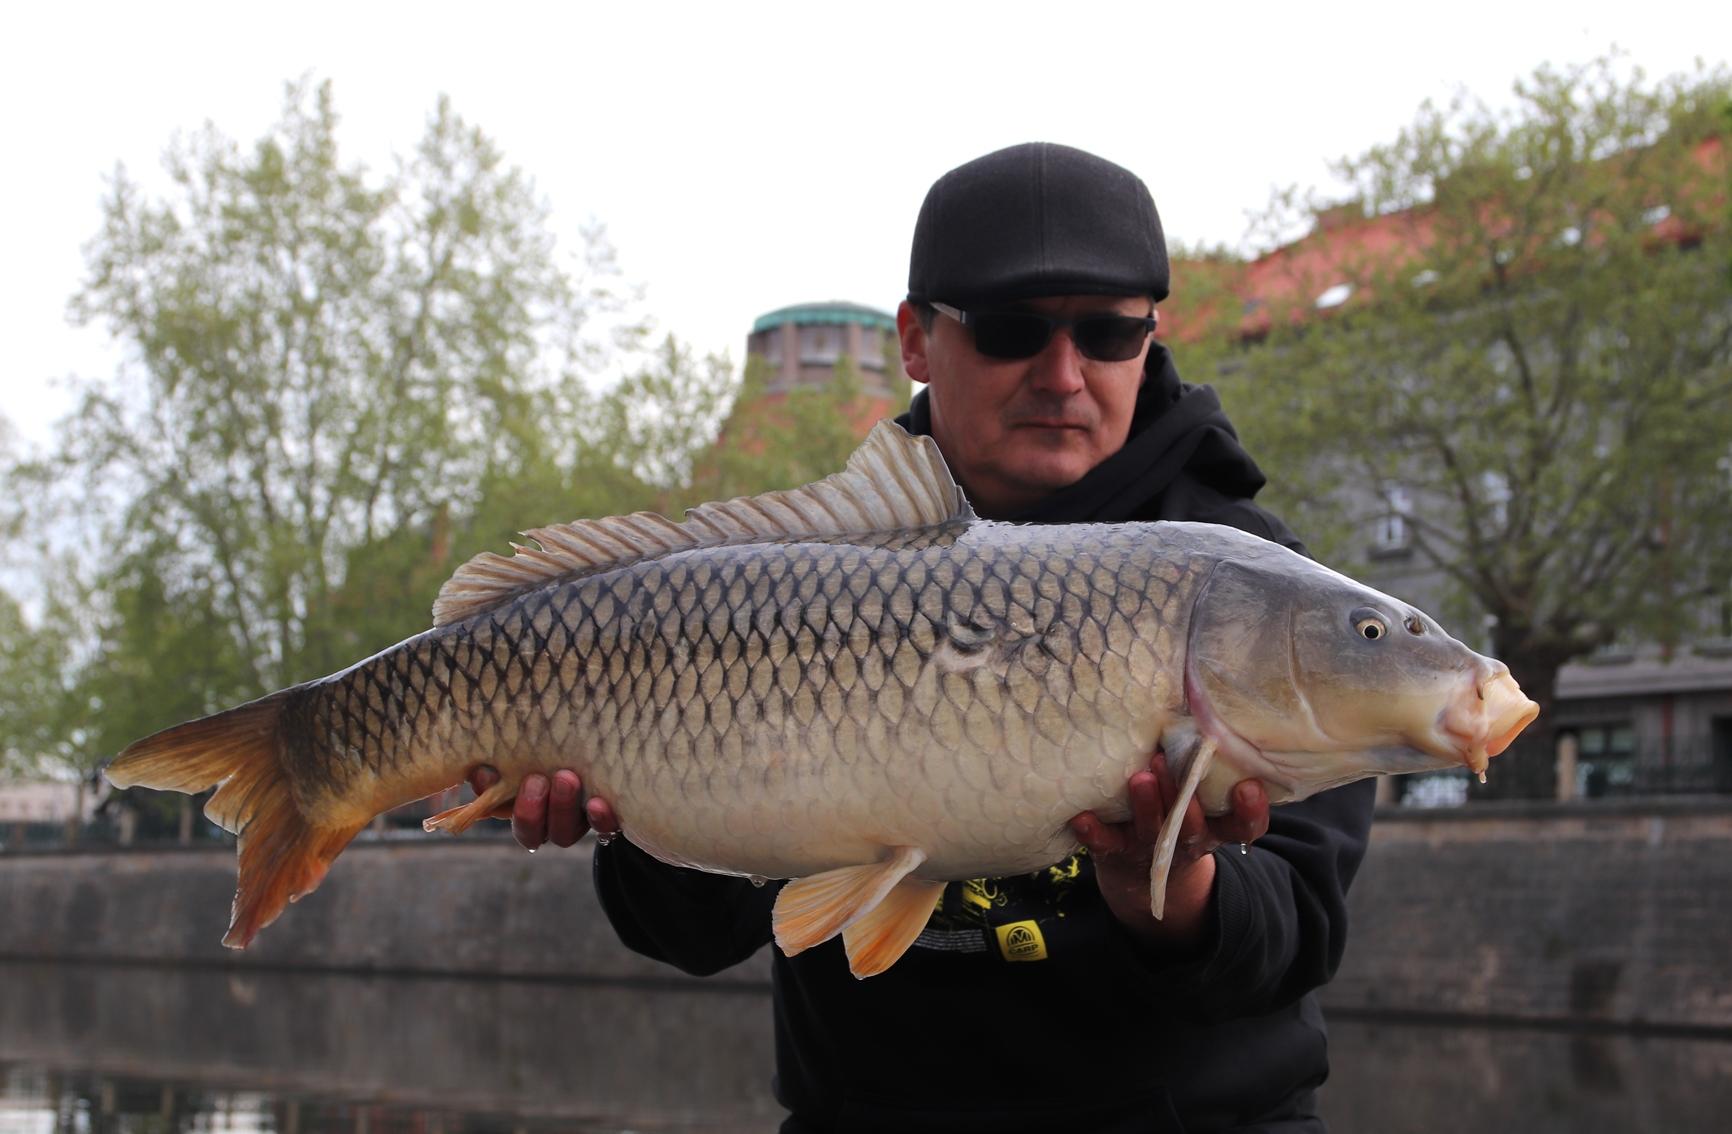 Boilies Mivardi Rapid Easy Catch Česnek & Chilli 3300 gr 20 mm